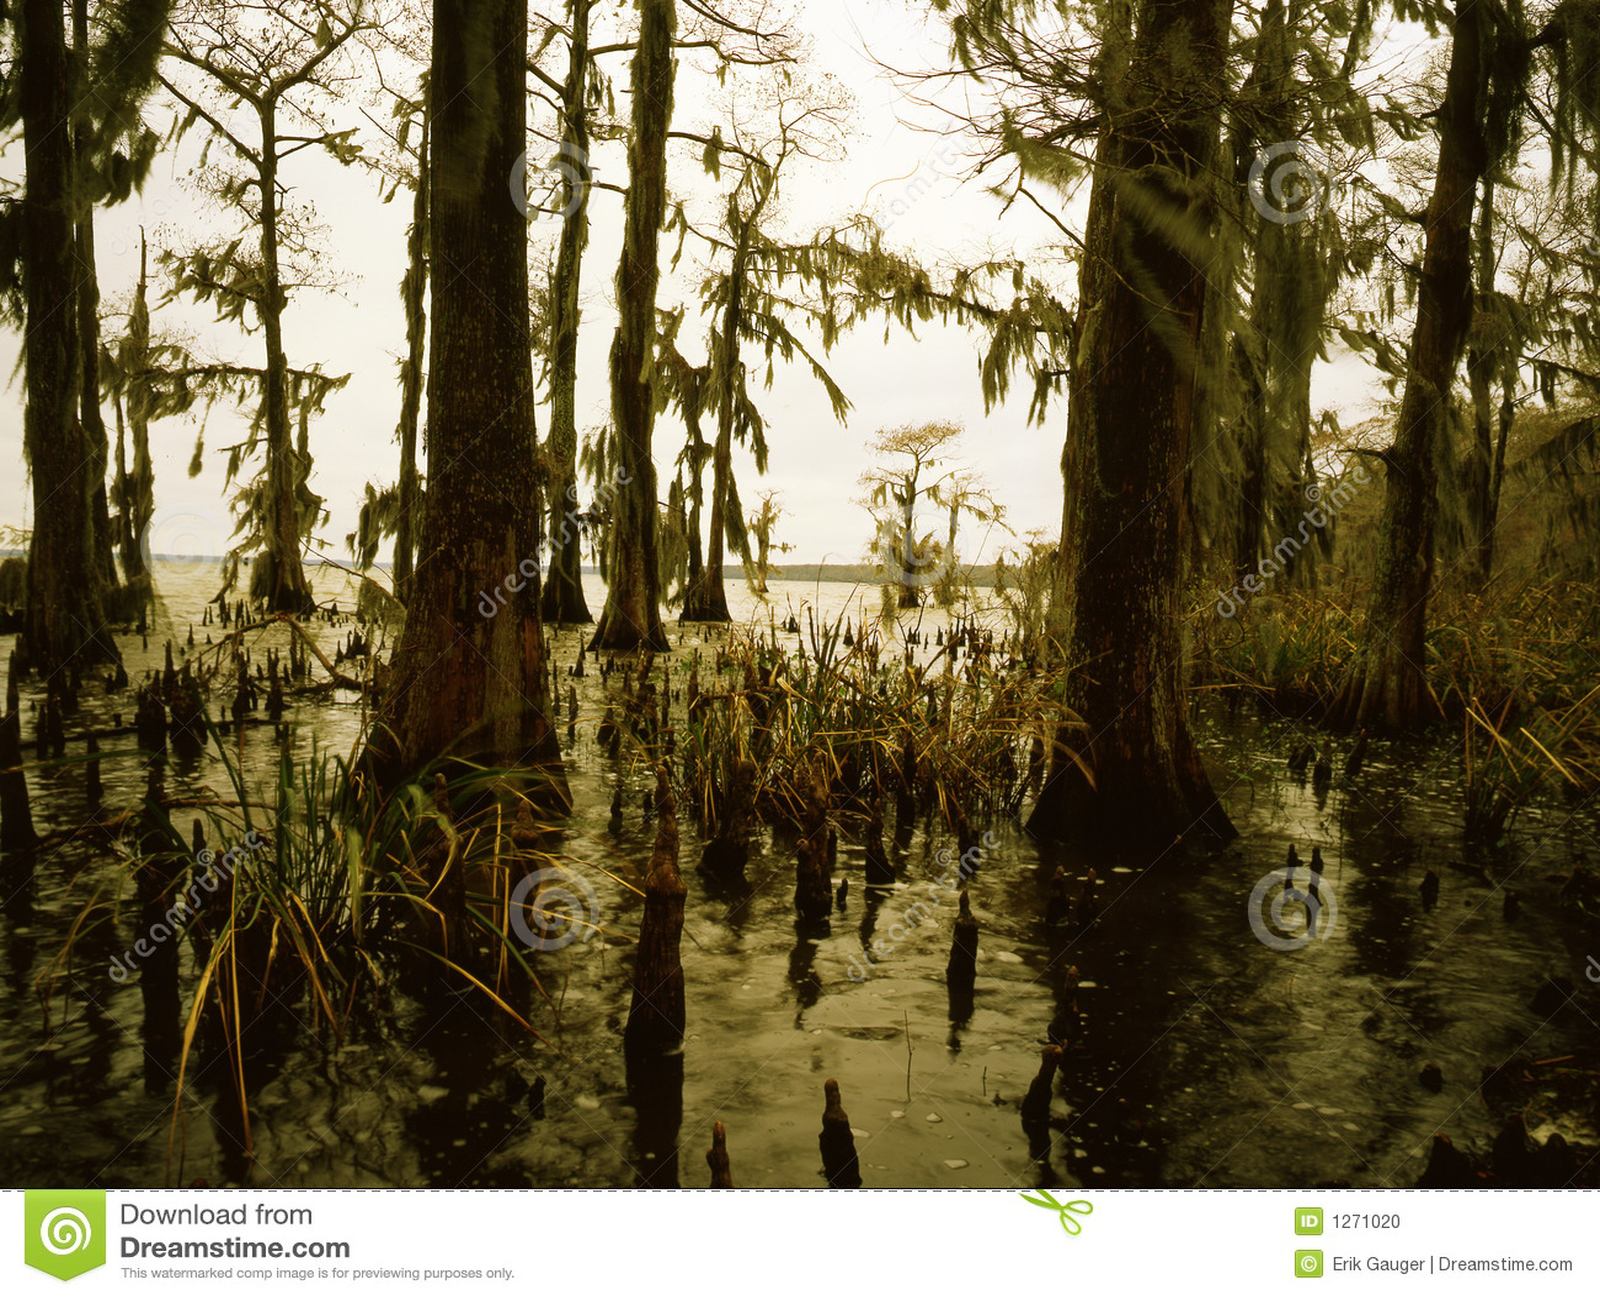 Download Southern Bayou stock photo. Image of firth, bayous, louisiana - 1271020